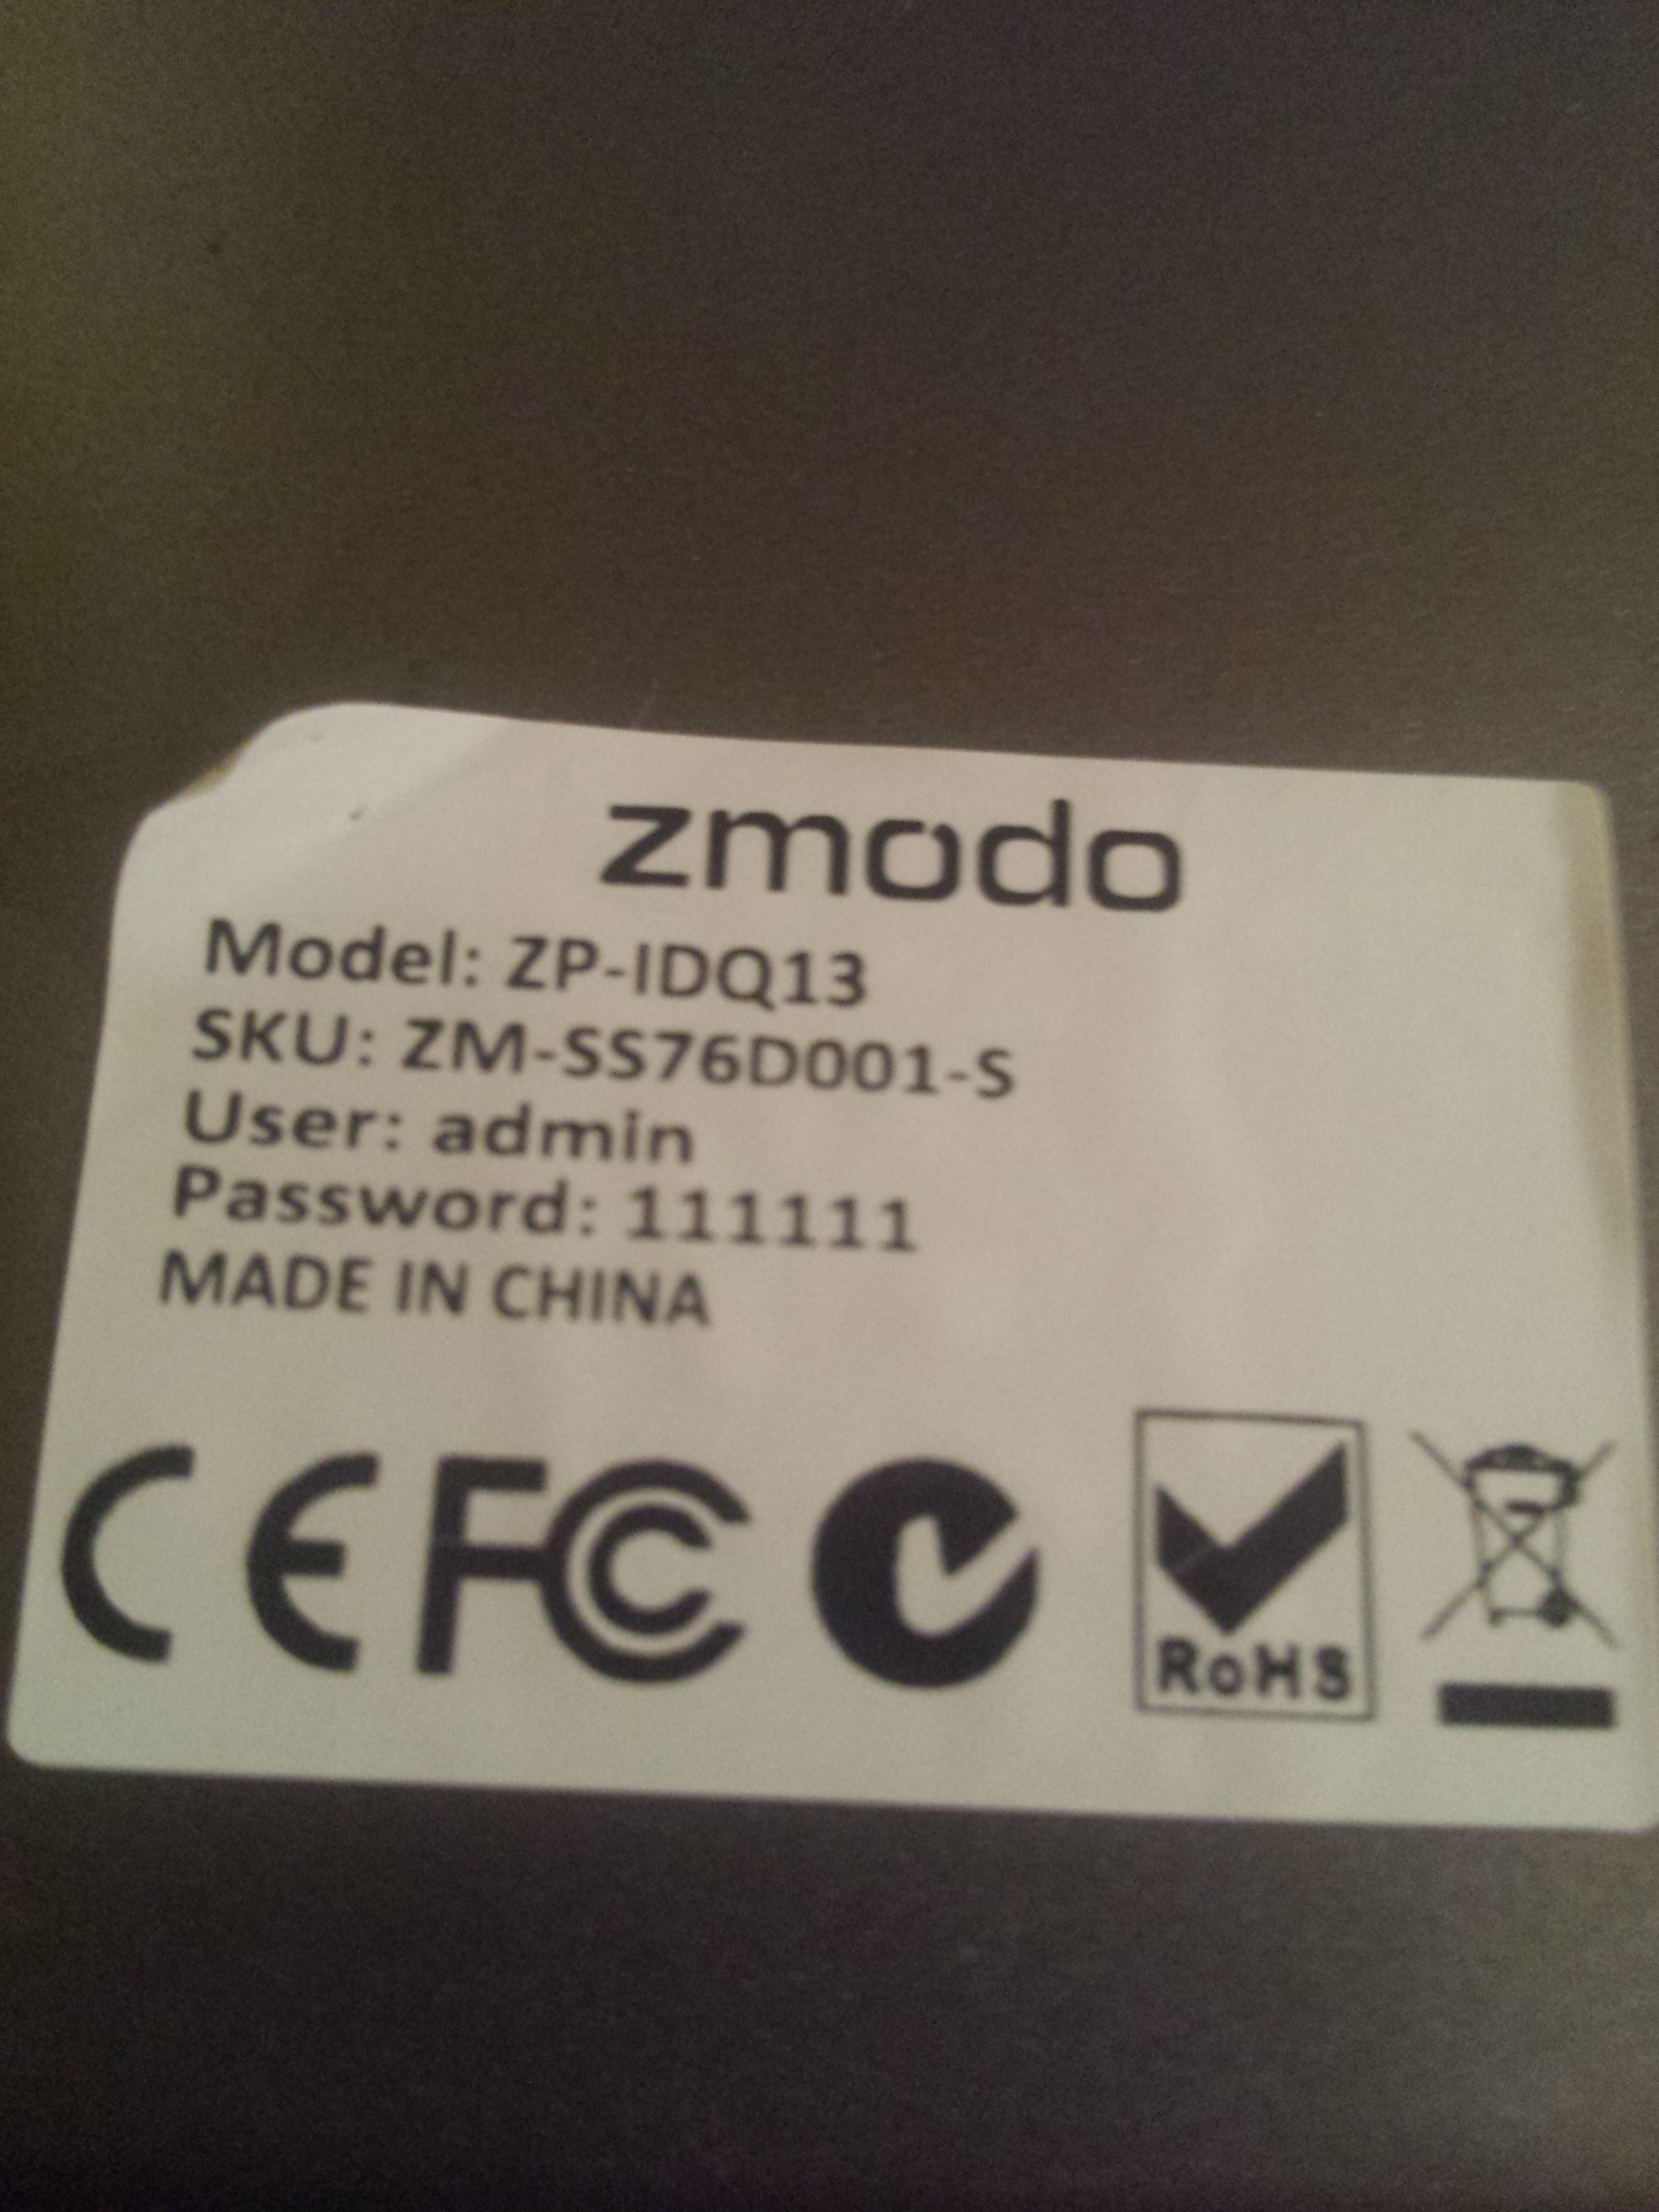 Exploring China Made NVRs DVRs & Cameras | Hackaday io